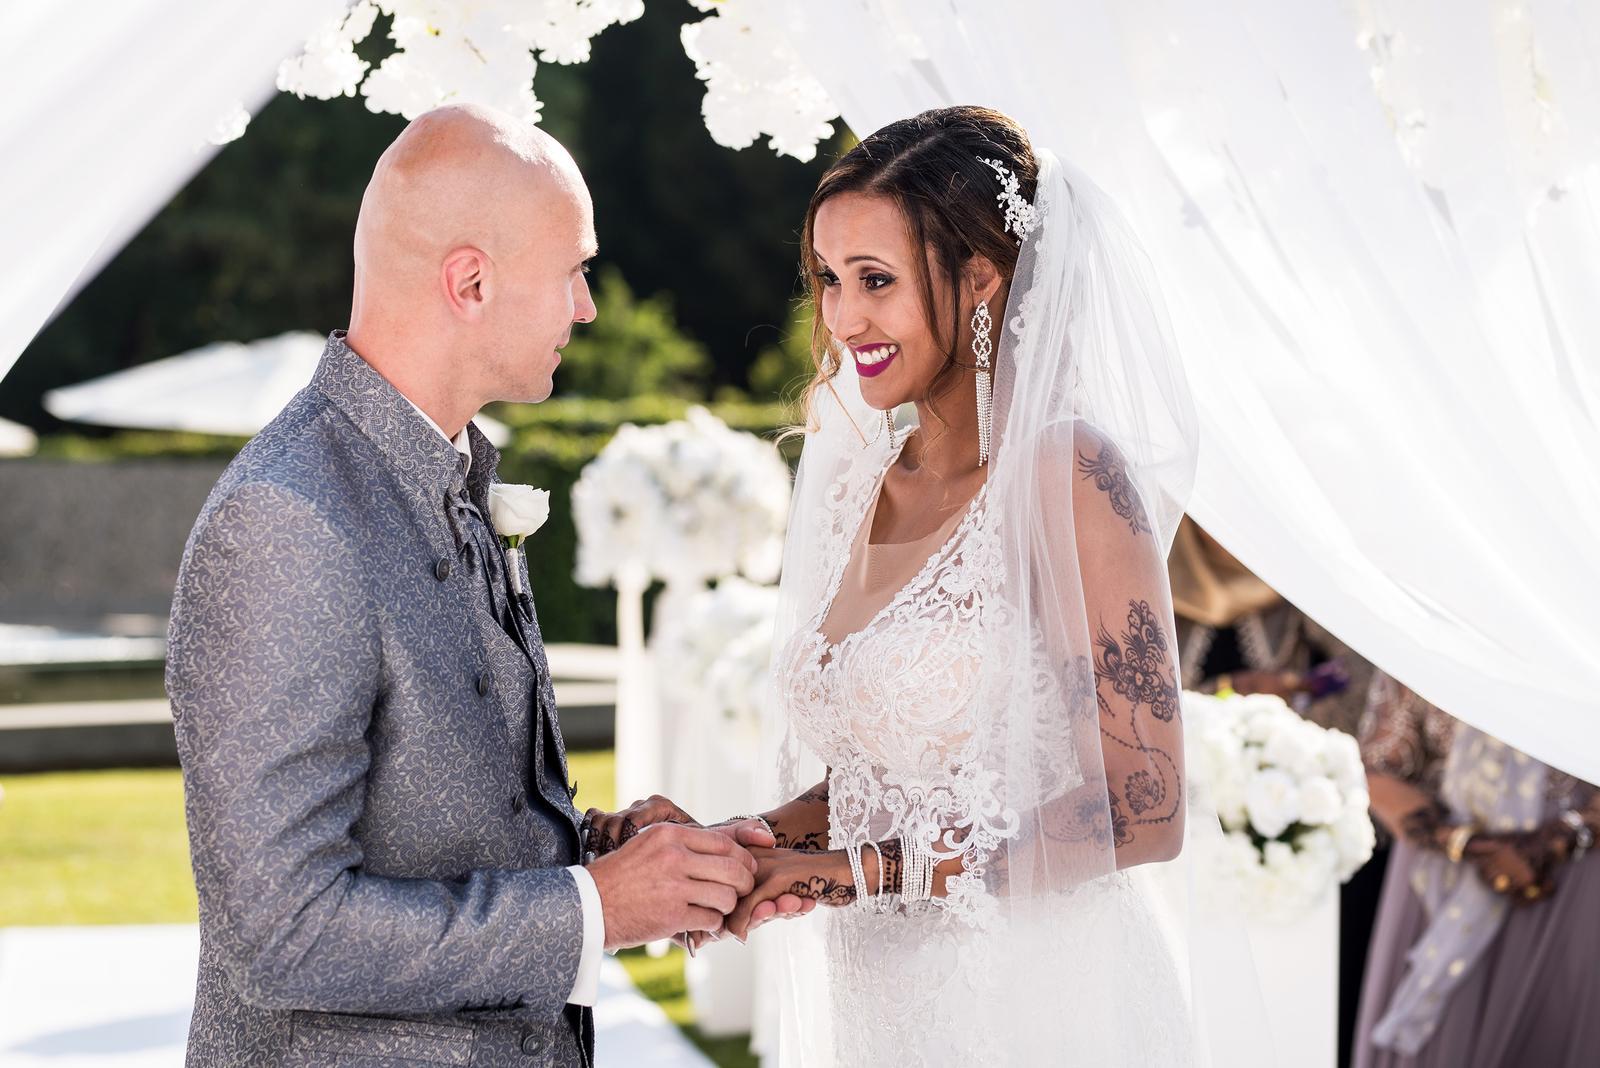 Svadba Zahra a Milan - Obrázok č. 39